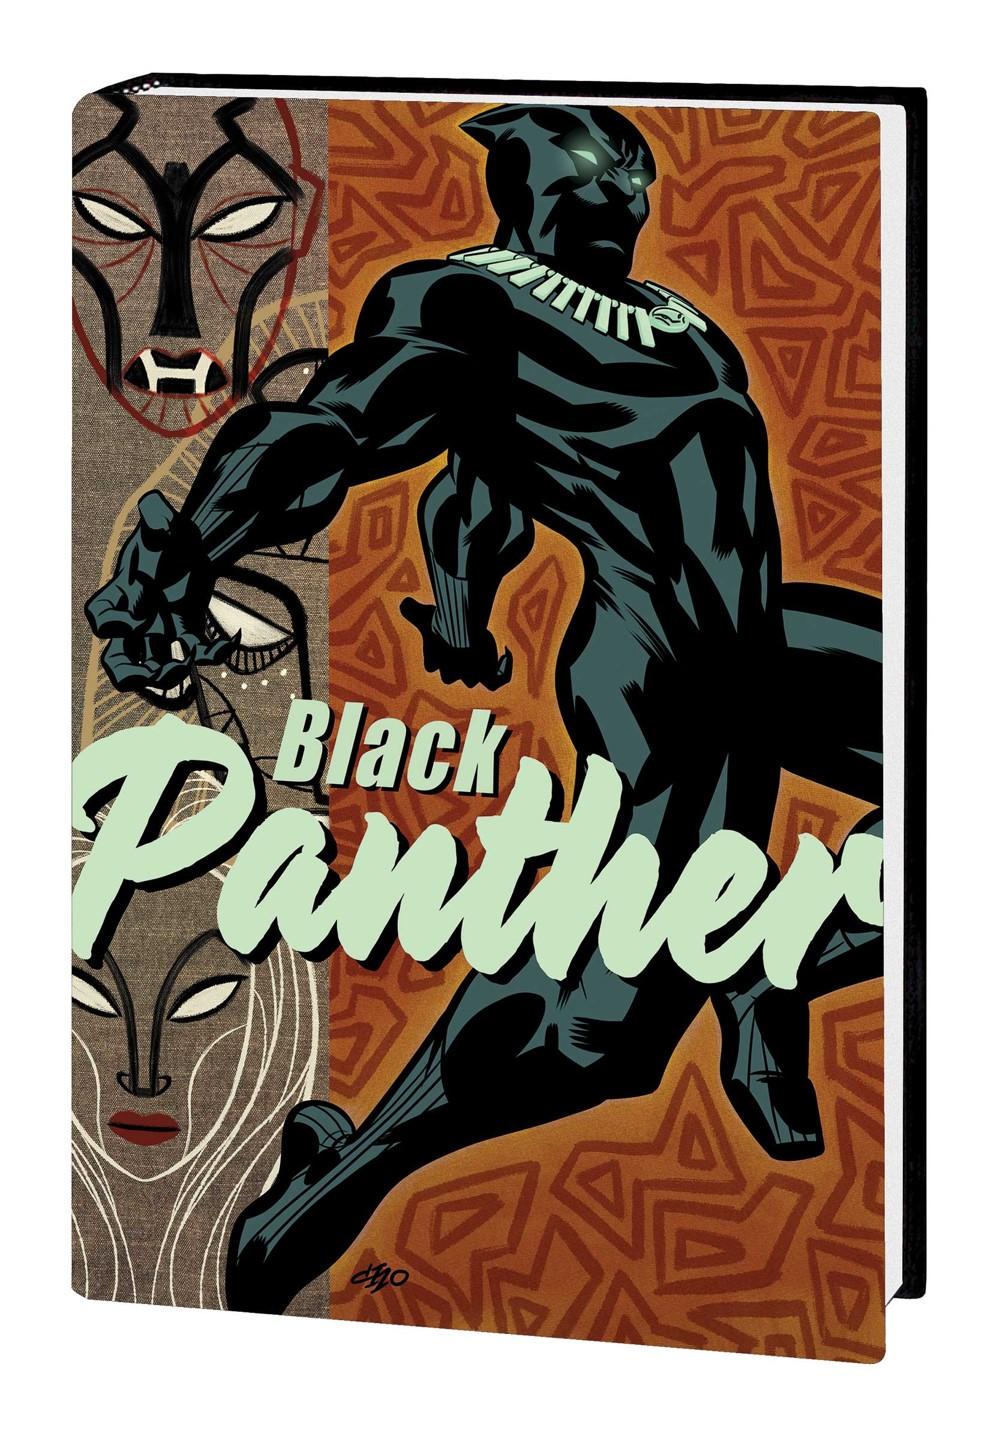 BLAPANTHER_COATES_OMNI_HC_CHO Marvel Comics December 2021 Solicitations